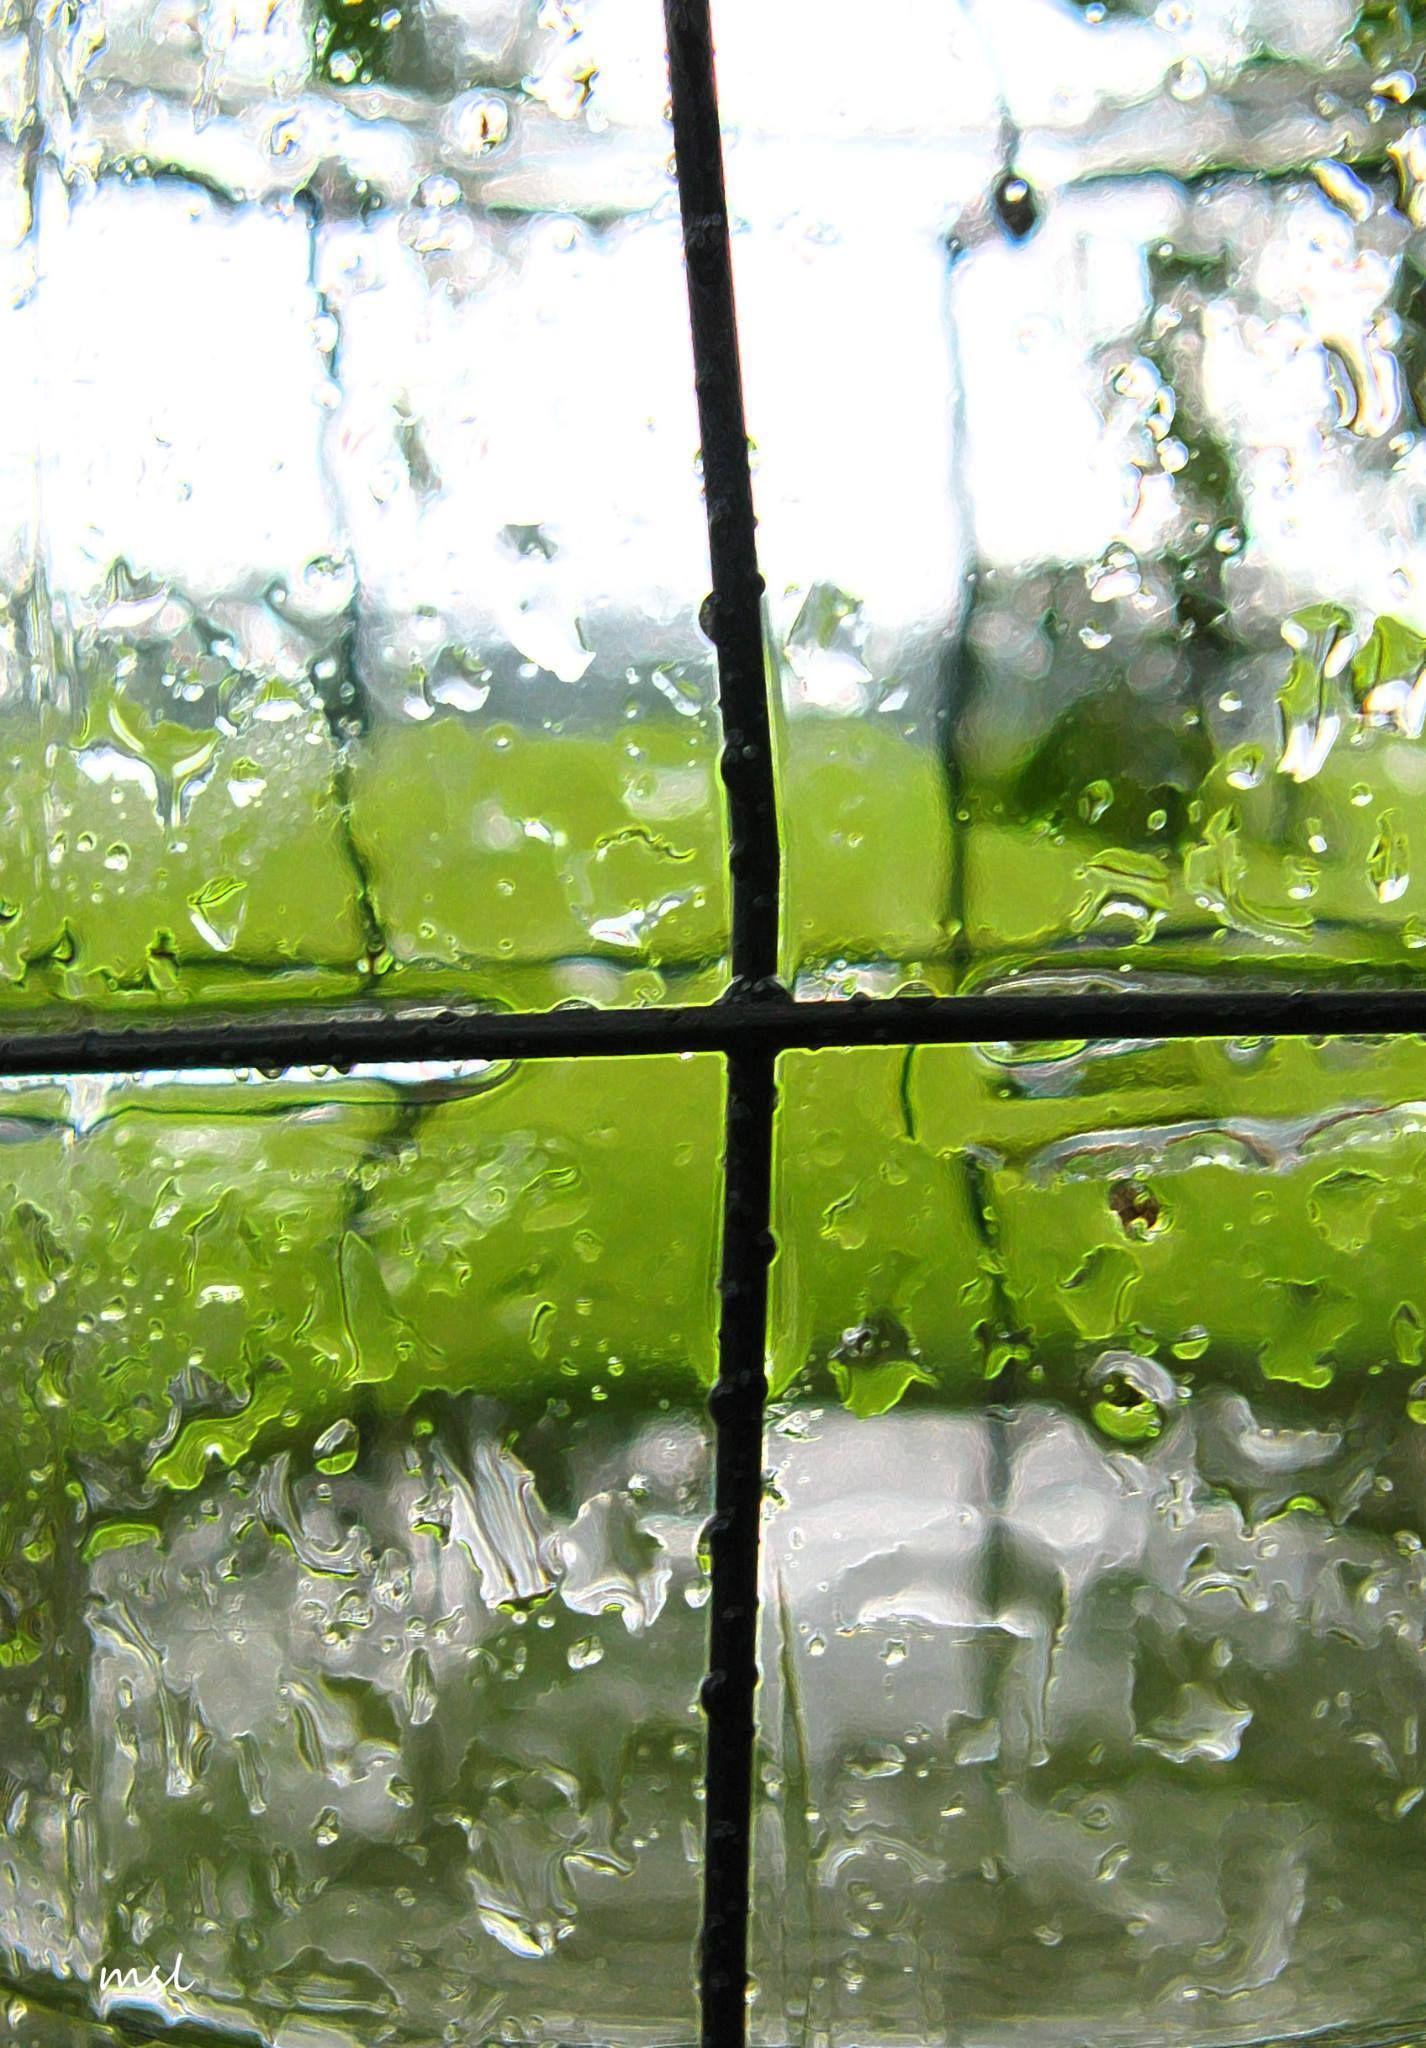 Rain I Love Watching It Through A Window With Images I Love Rain